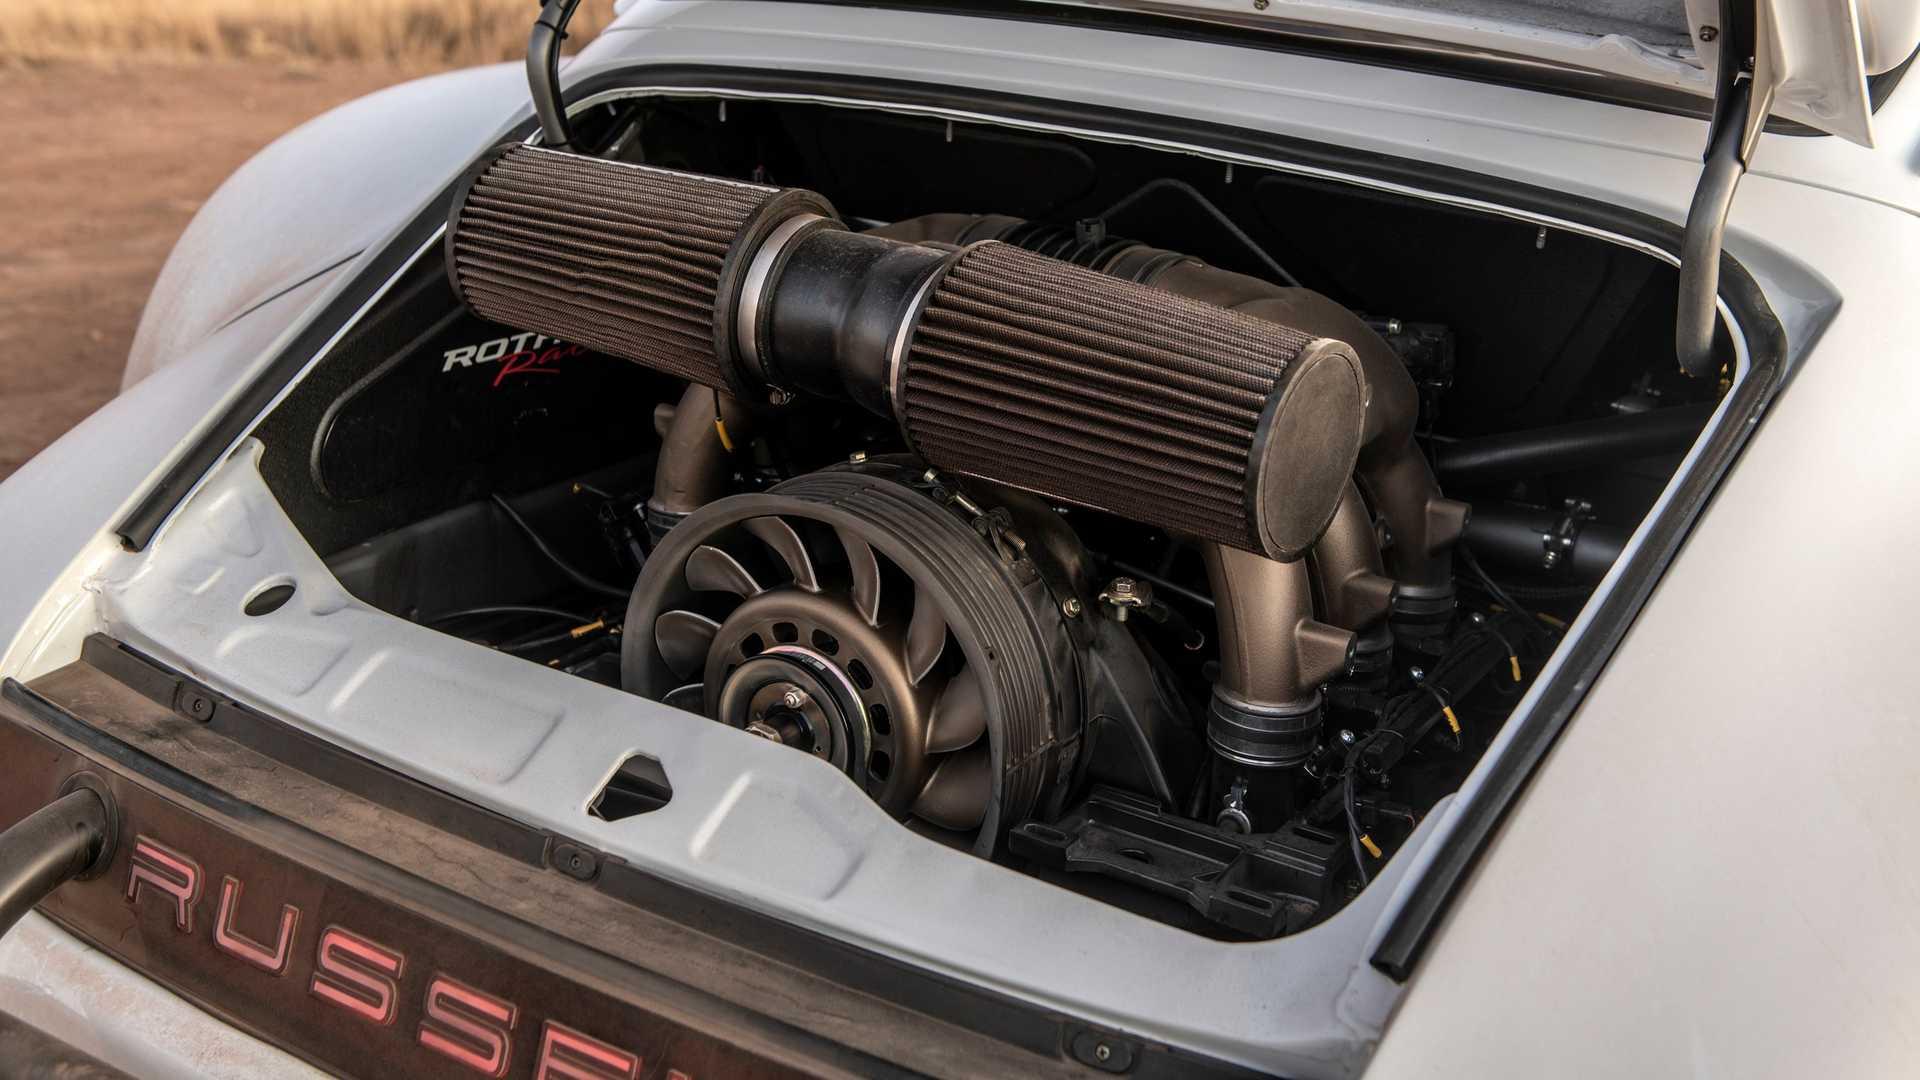 russell-built-fabrications-911-baja-14